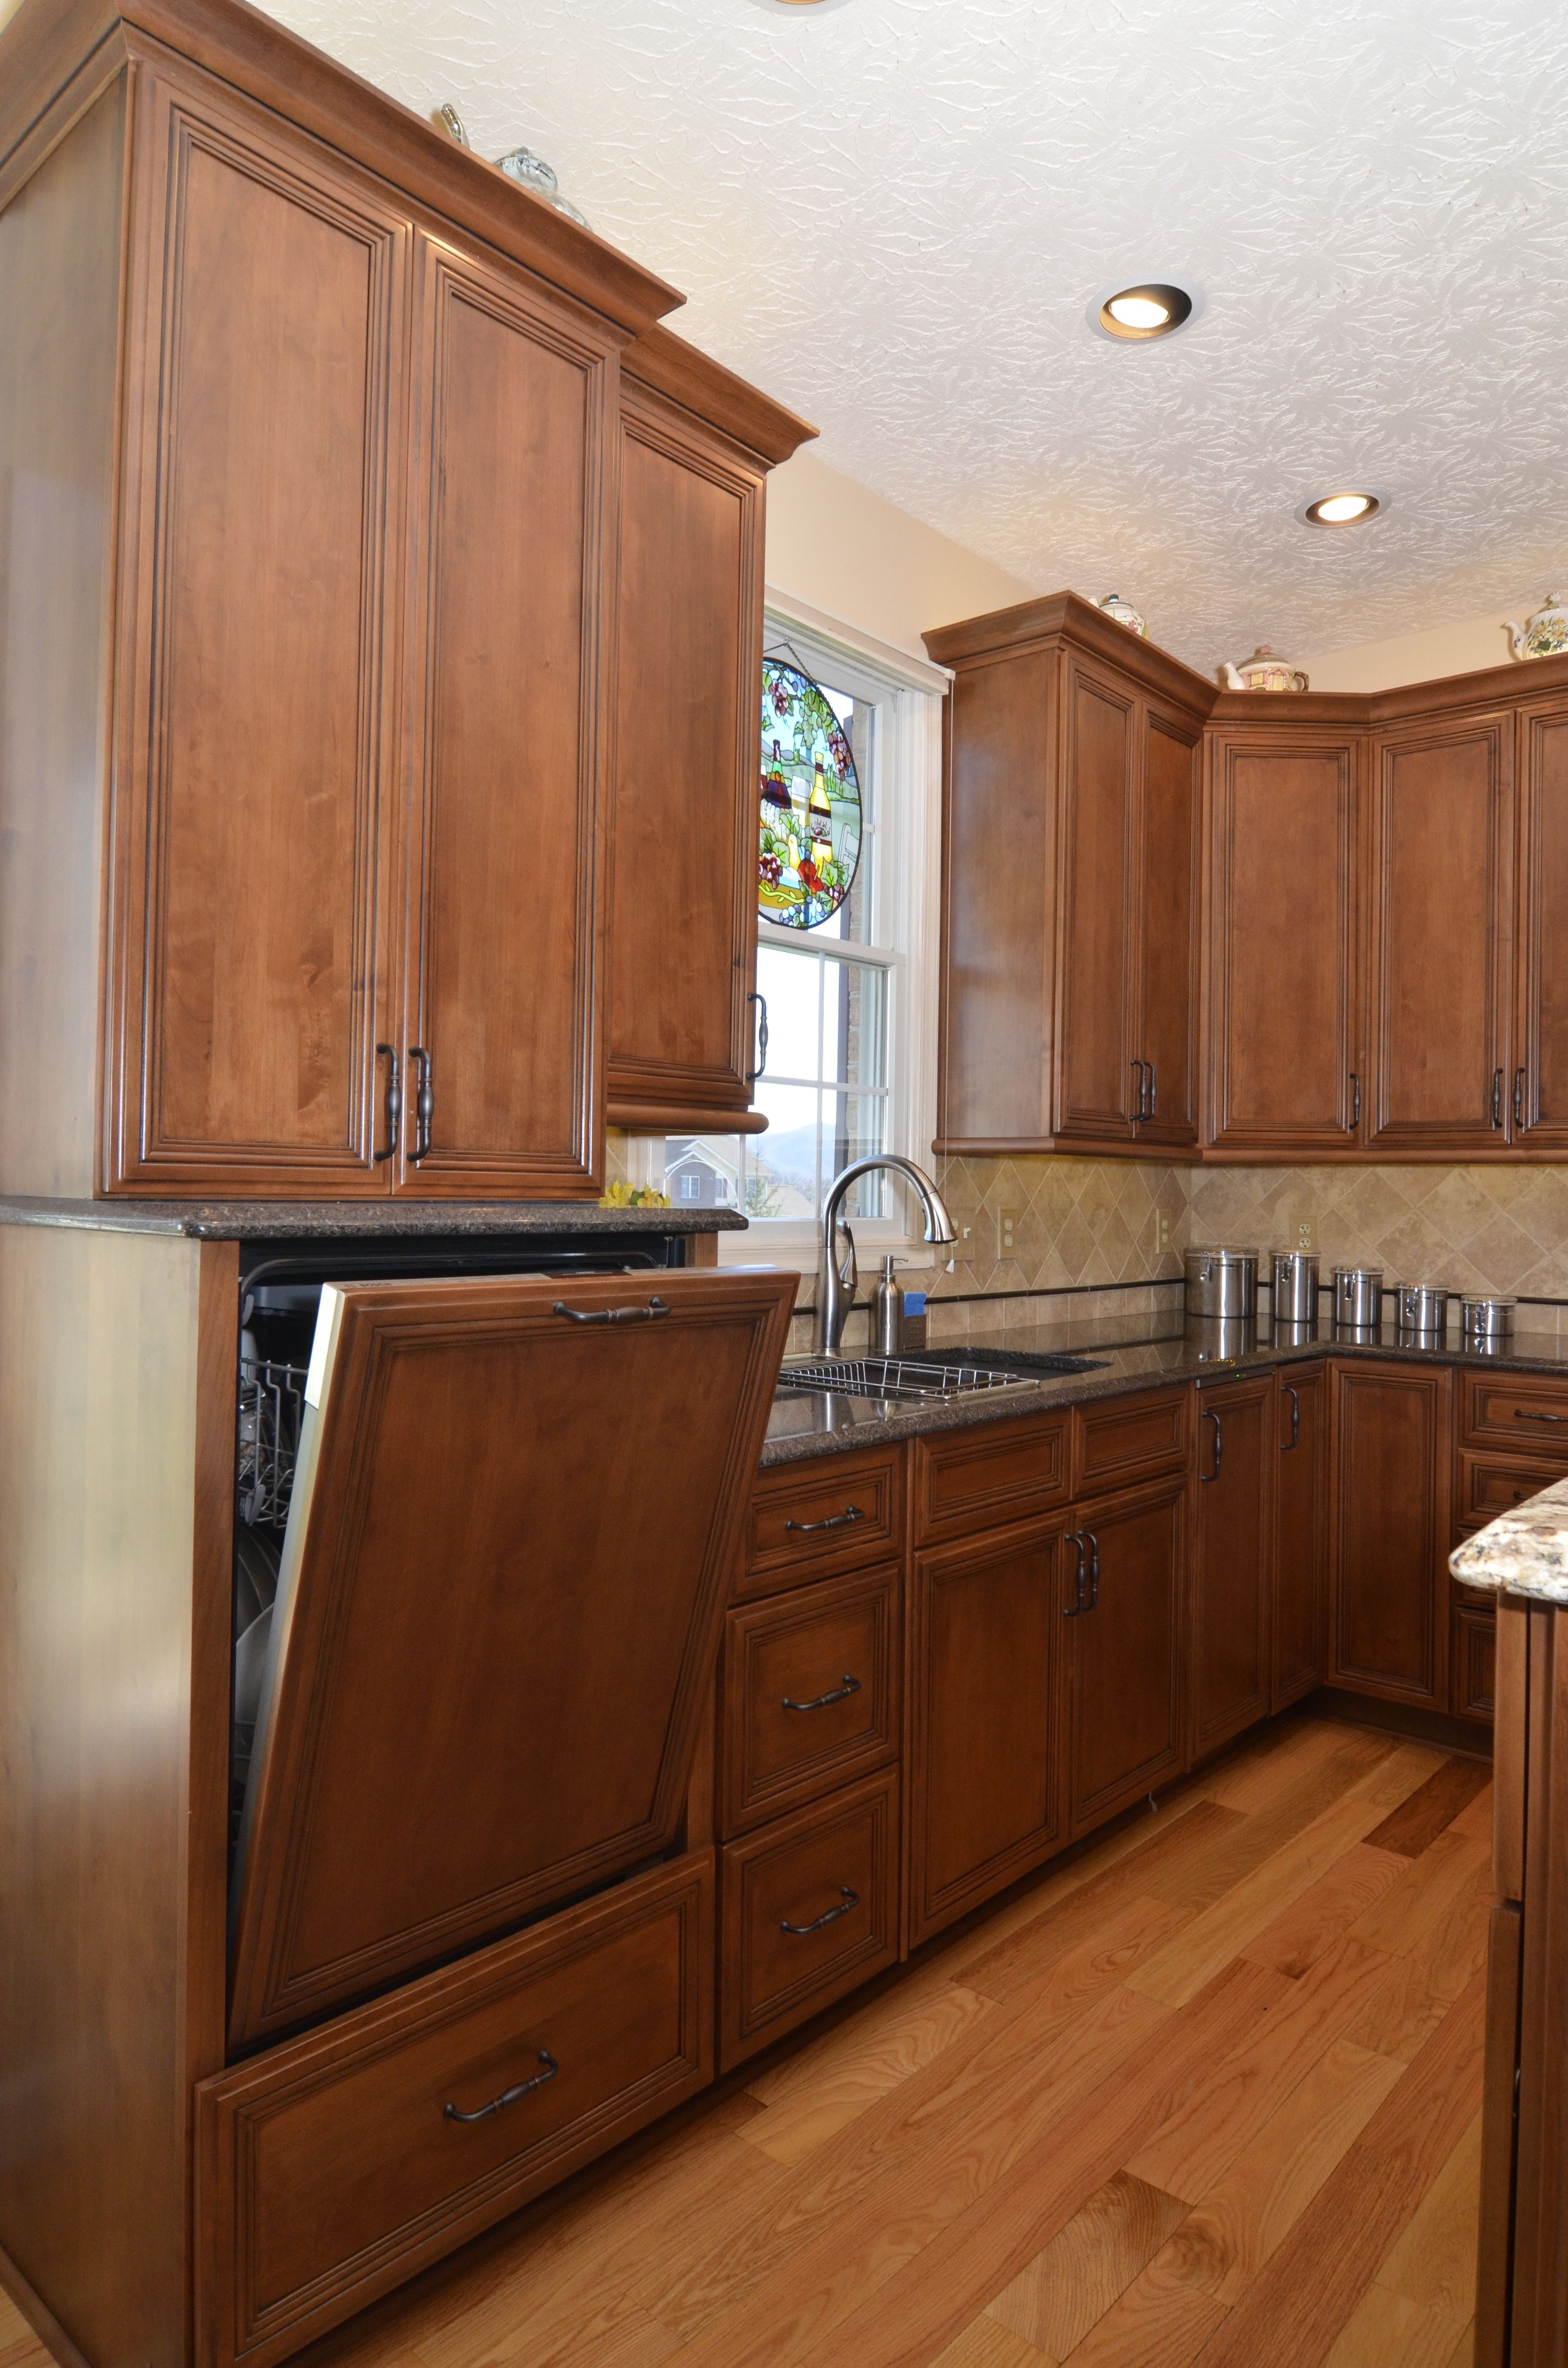 Hanover Dynasty Raised Dishwasher Kitchen Bathroom Remodel Kitchen Design Home Kitchens